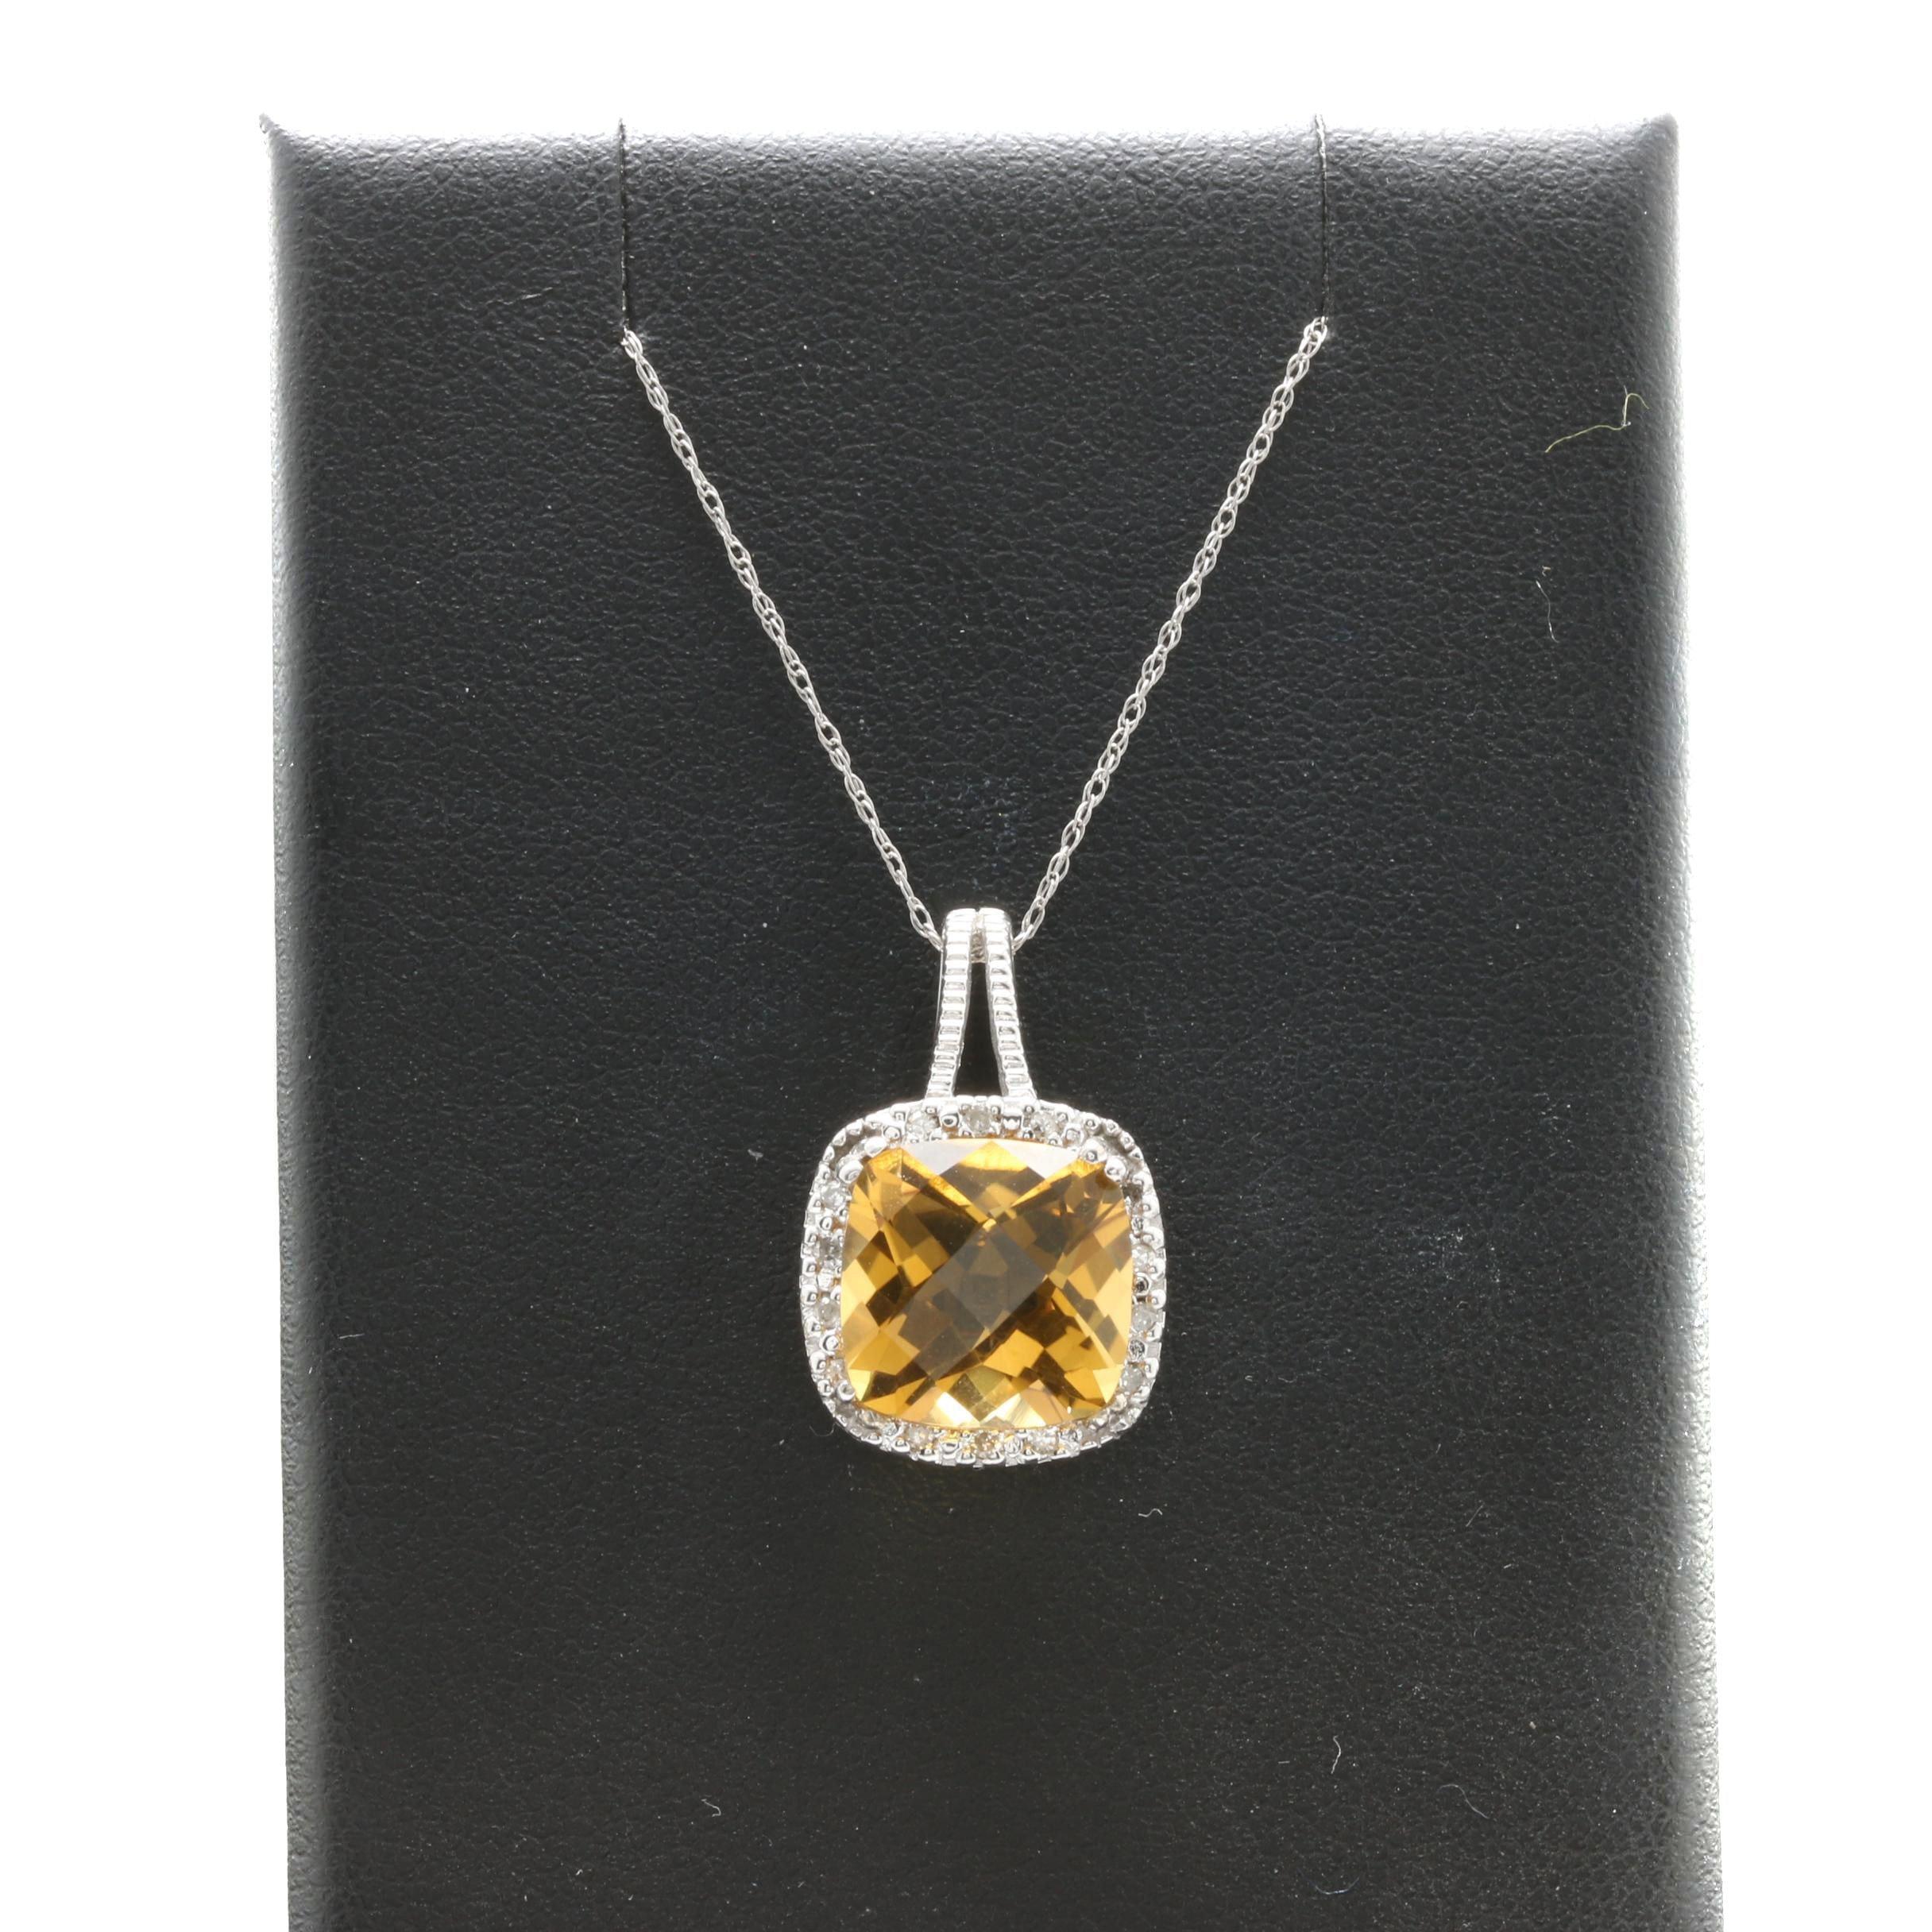 10K White Gold Lemon Quartz and Diamond Pendant Necklace